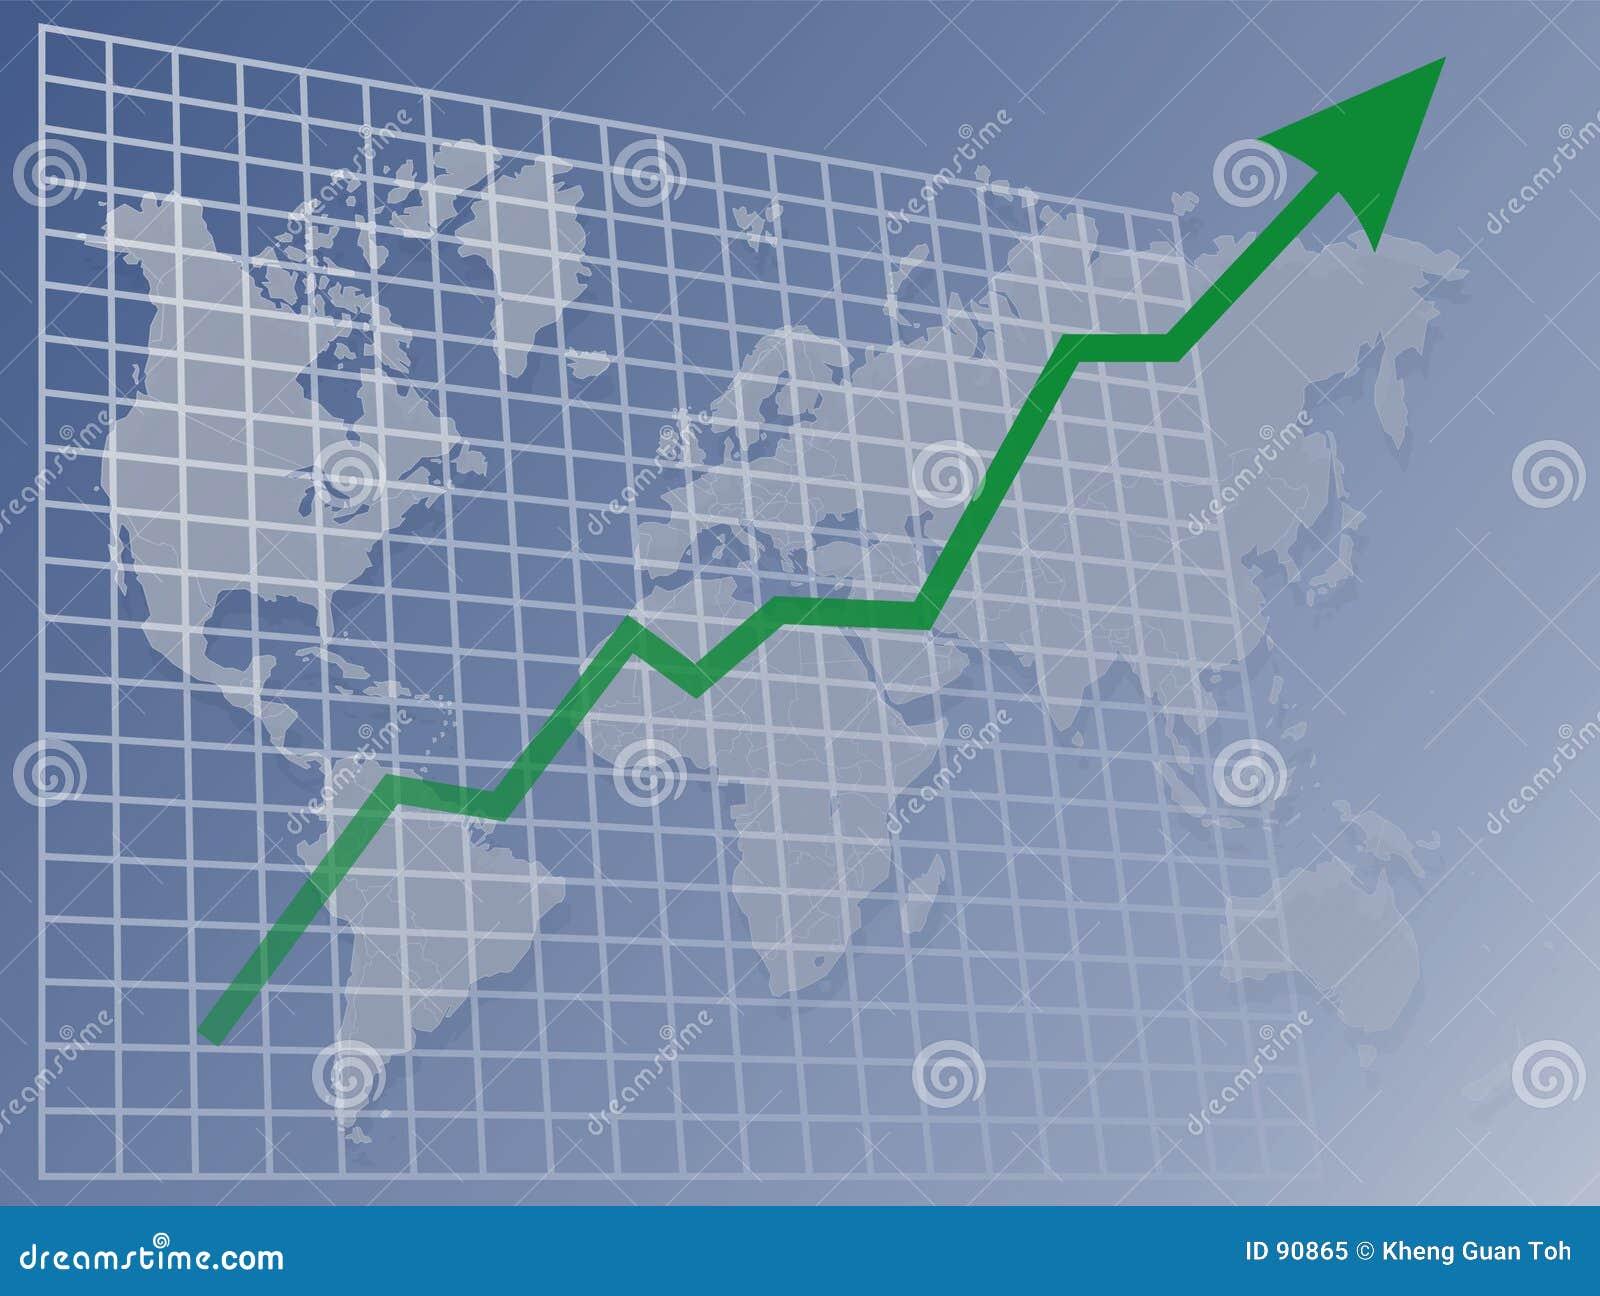 Forex charts analise sagteware